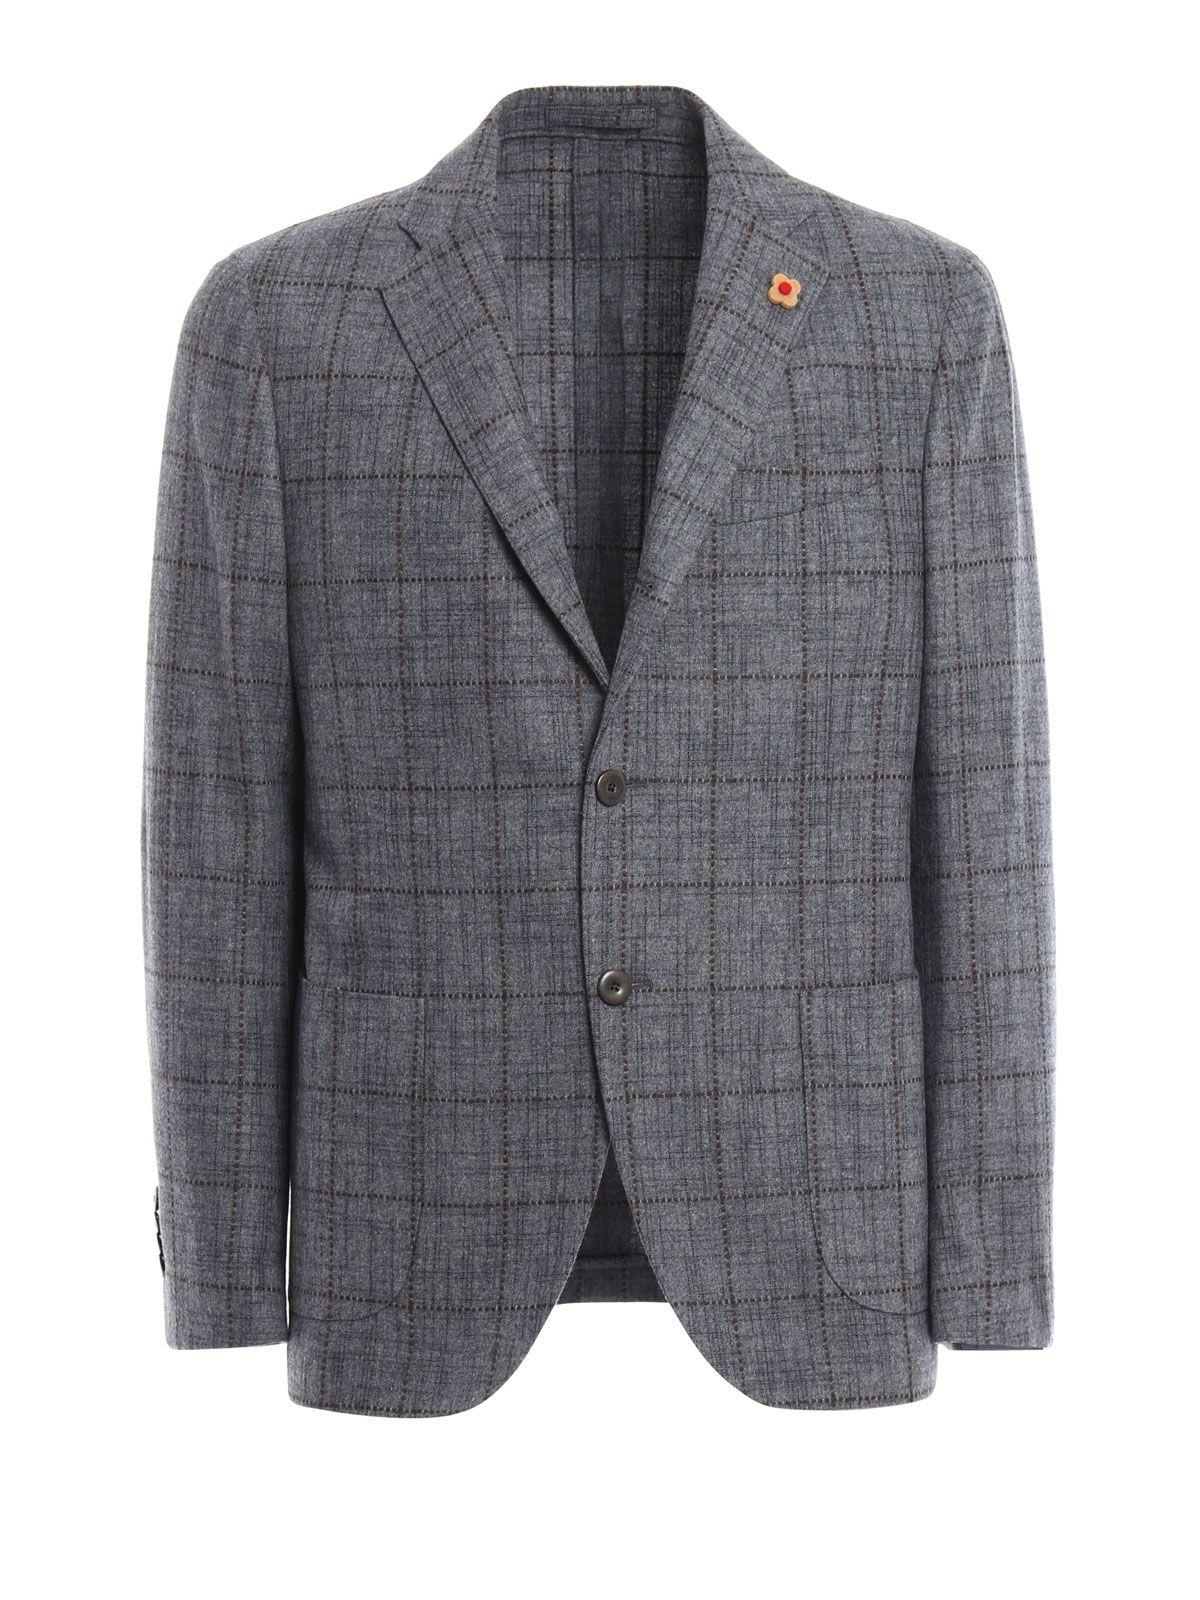 Lardini Checked Wool Blend Blazer